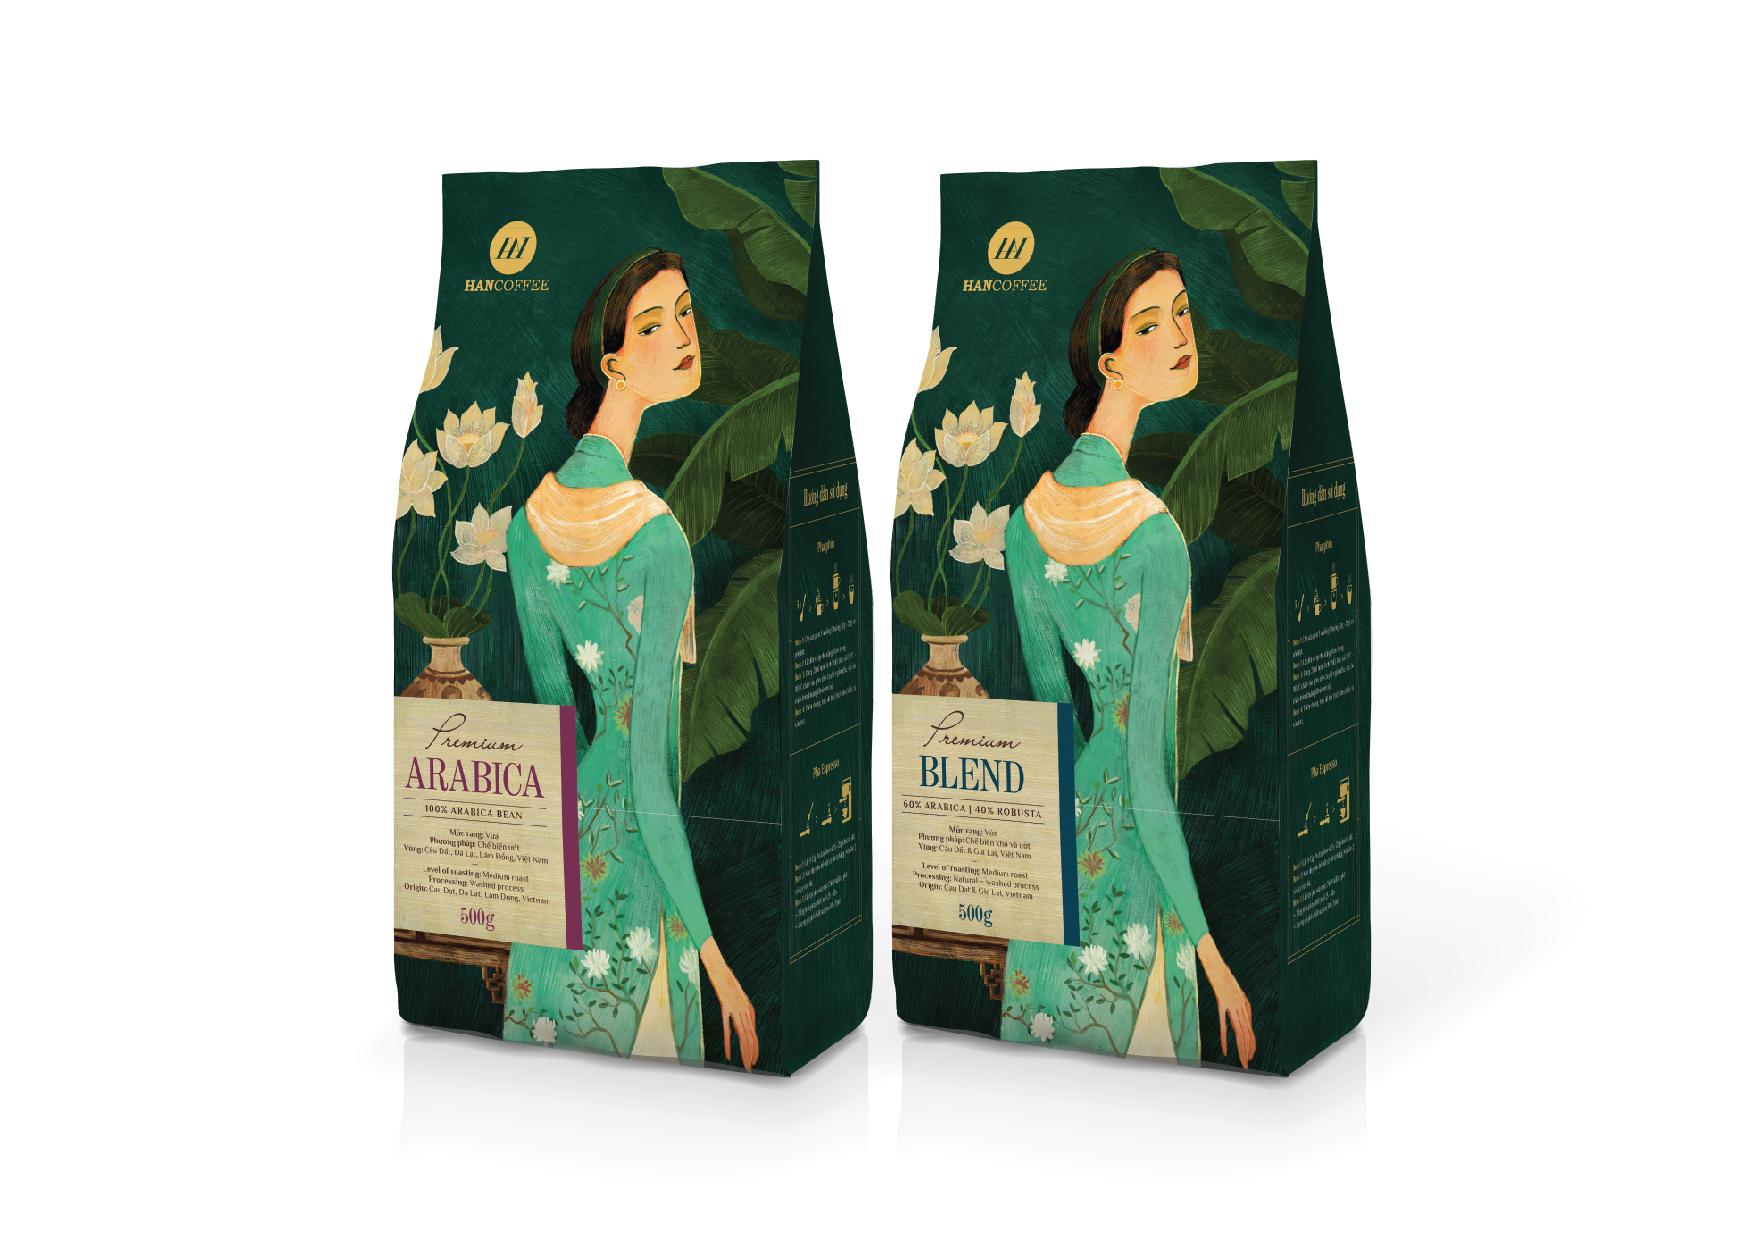 Hancoffee Premium blend